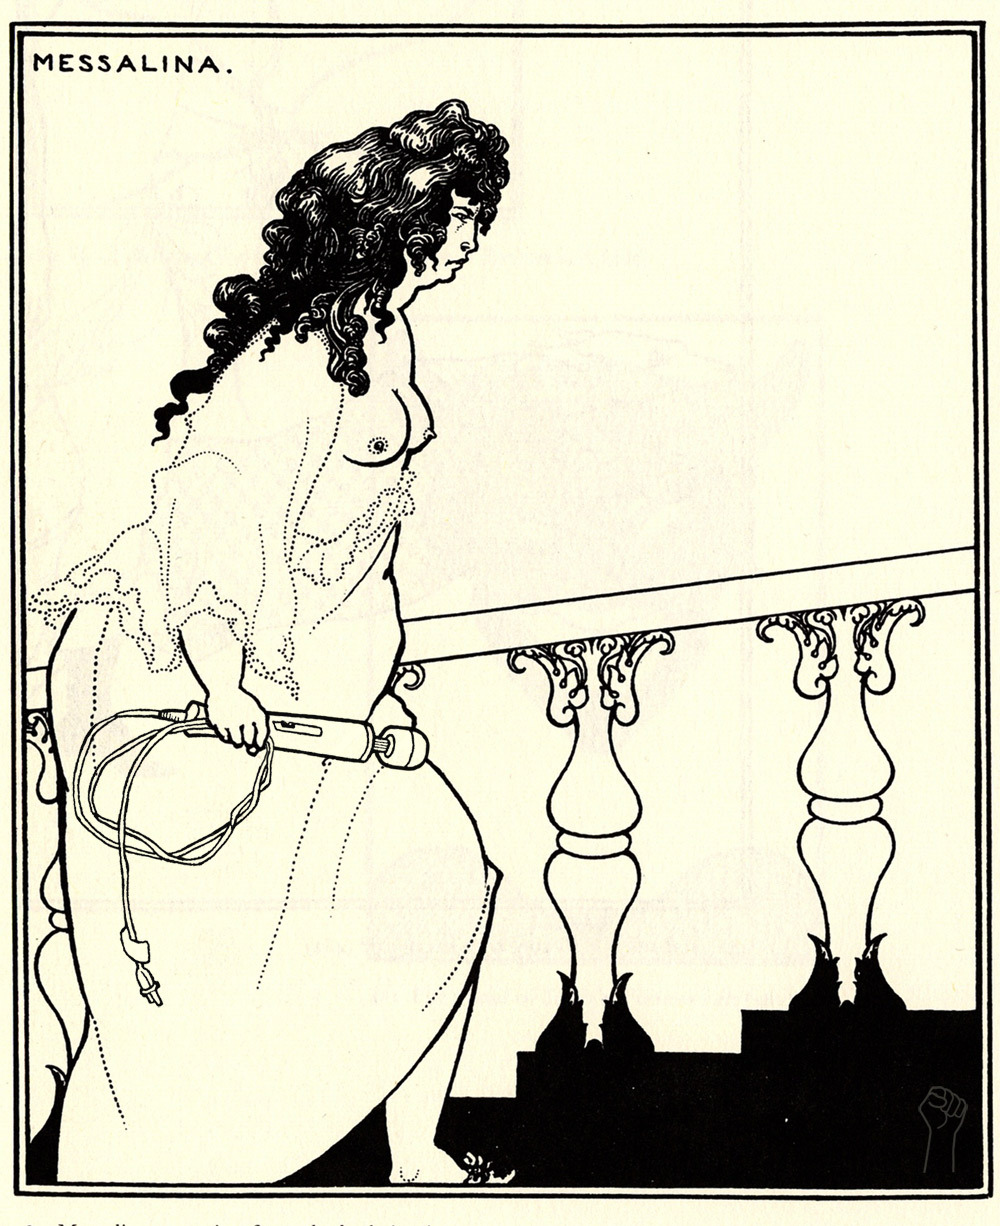 Messalina Returning with Magic Wand by Aubrey Beardsley.